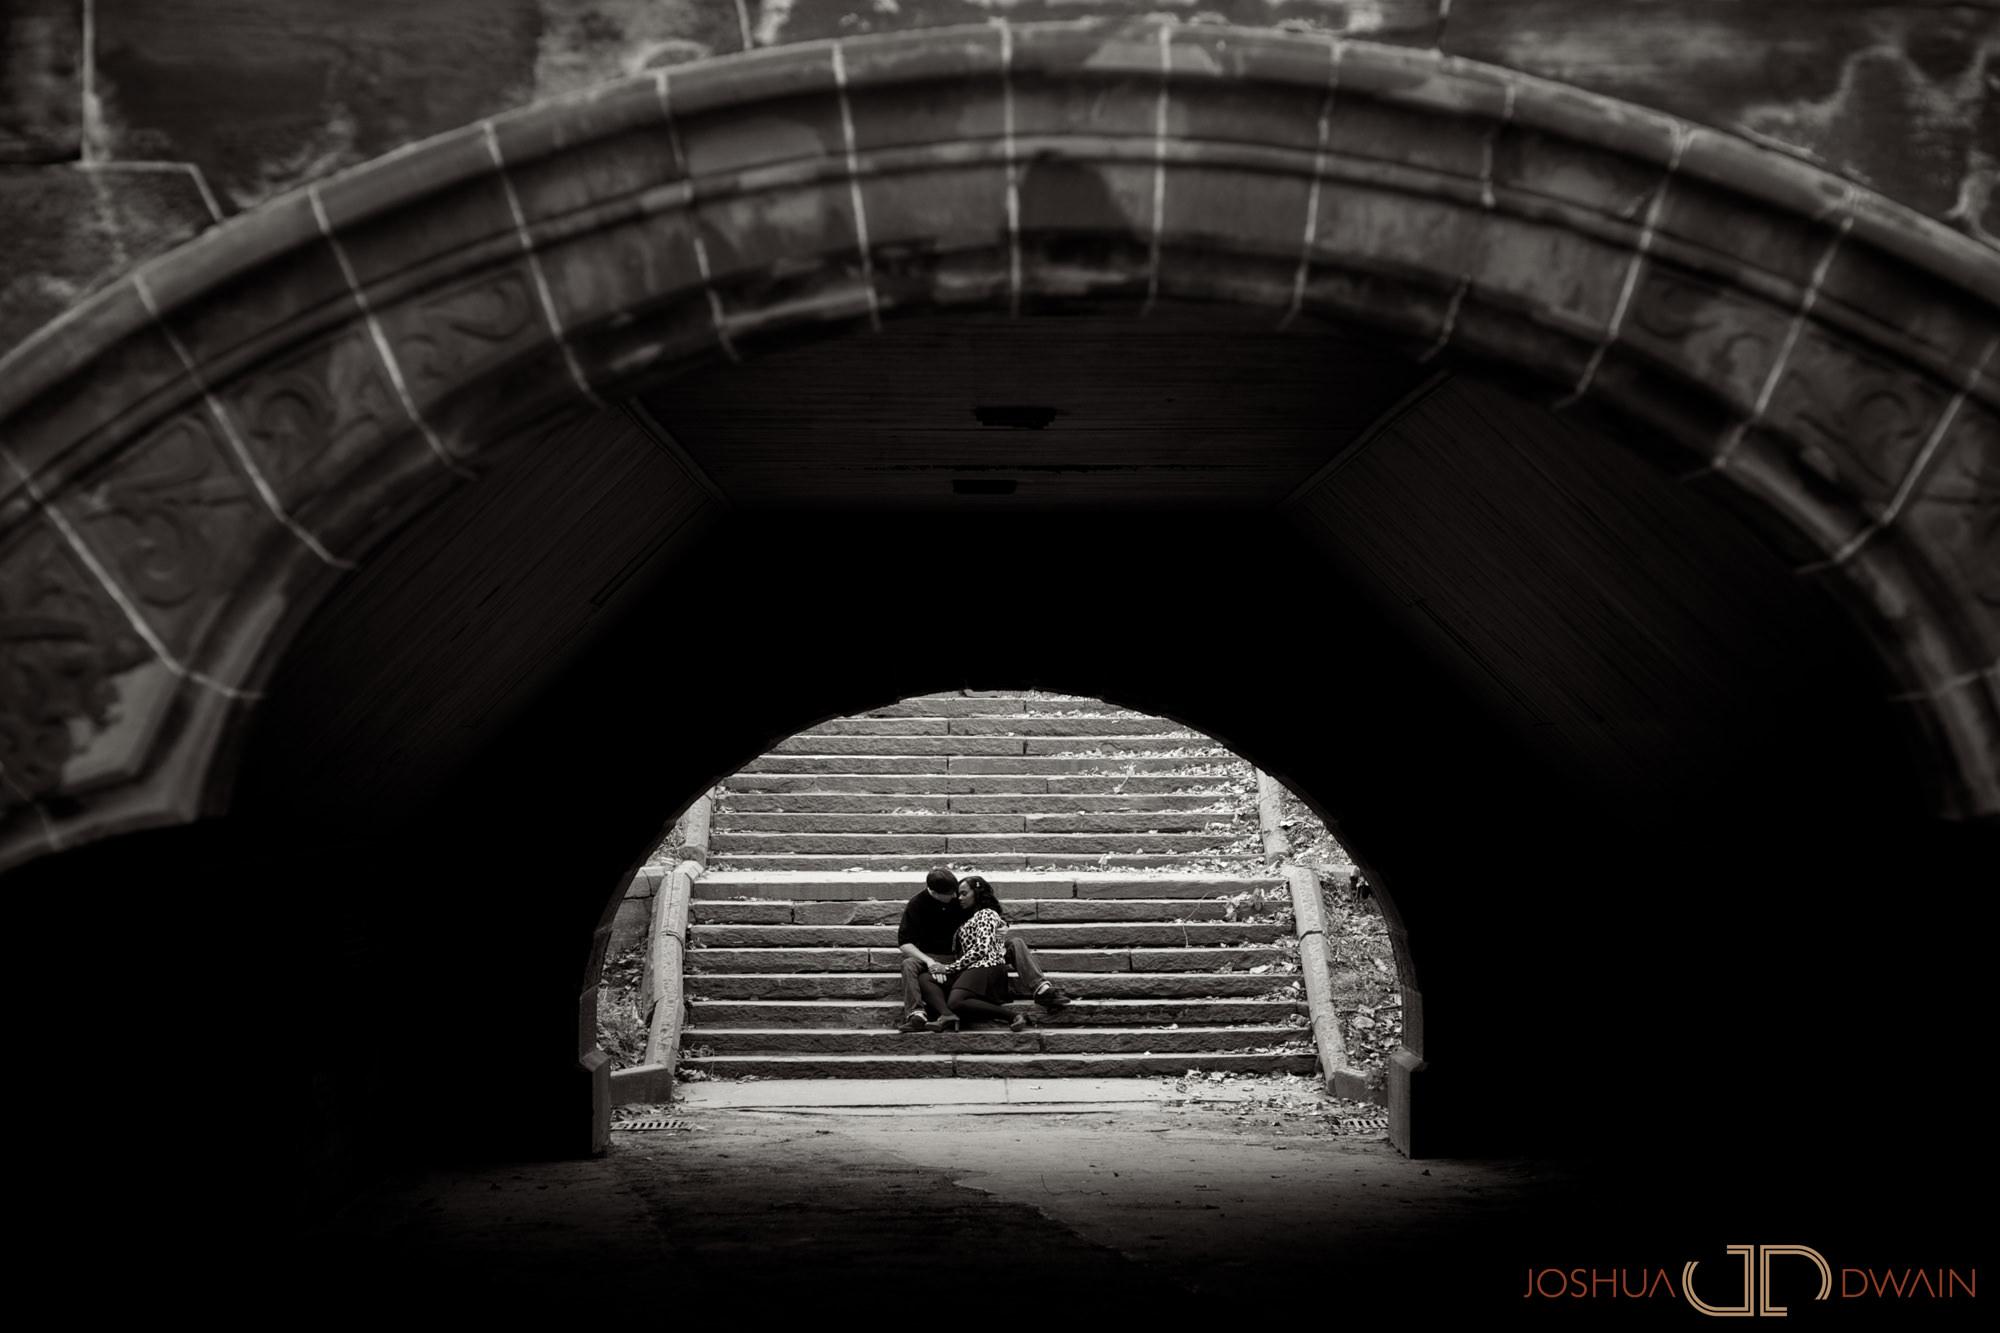 fritzie-stephen-003-central-park-new-york-city-ny-engagement-photographer-joshua-dwain-2011-11-05_fs_014